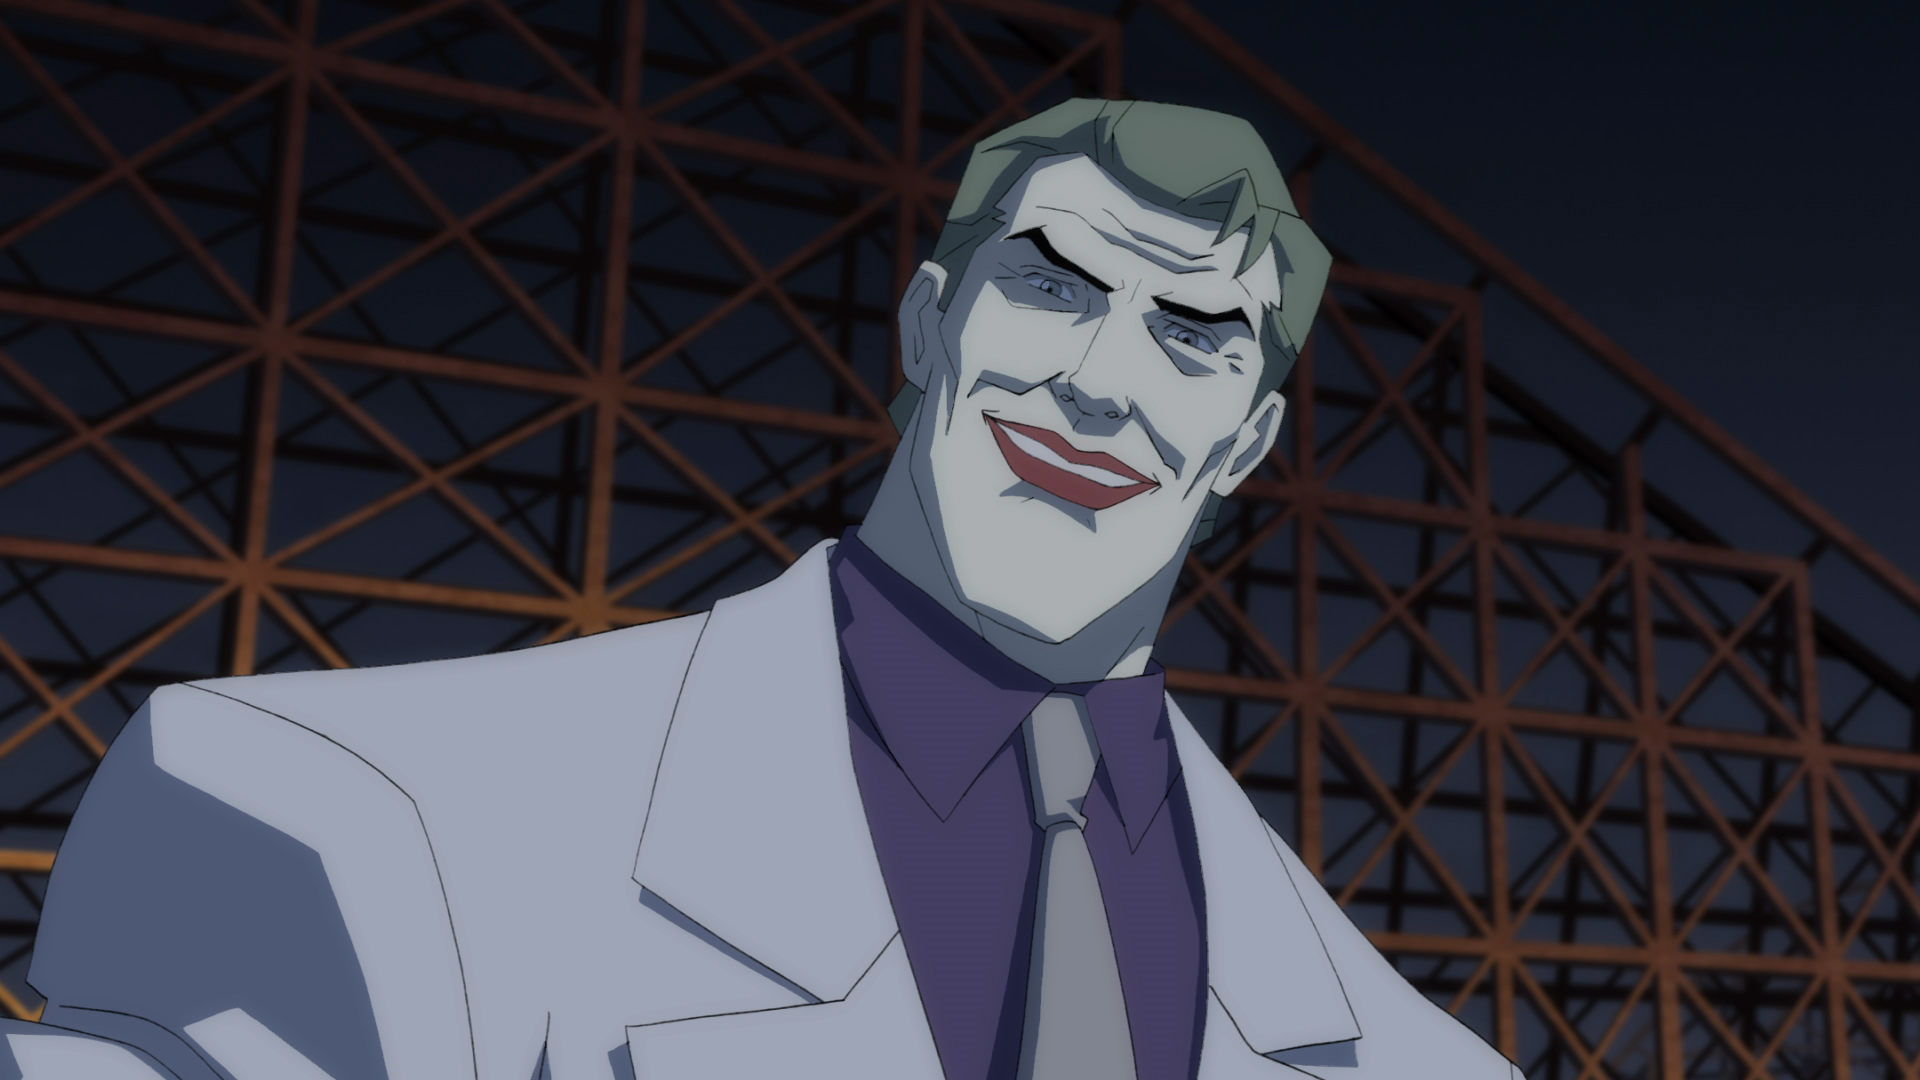 Joker (The Dark Knight Returns) | Villains Wiki | FANDOM ...